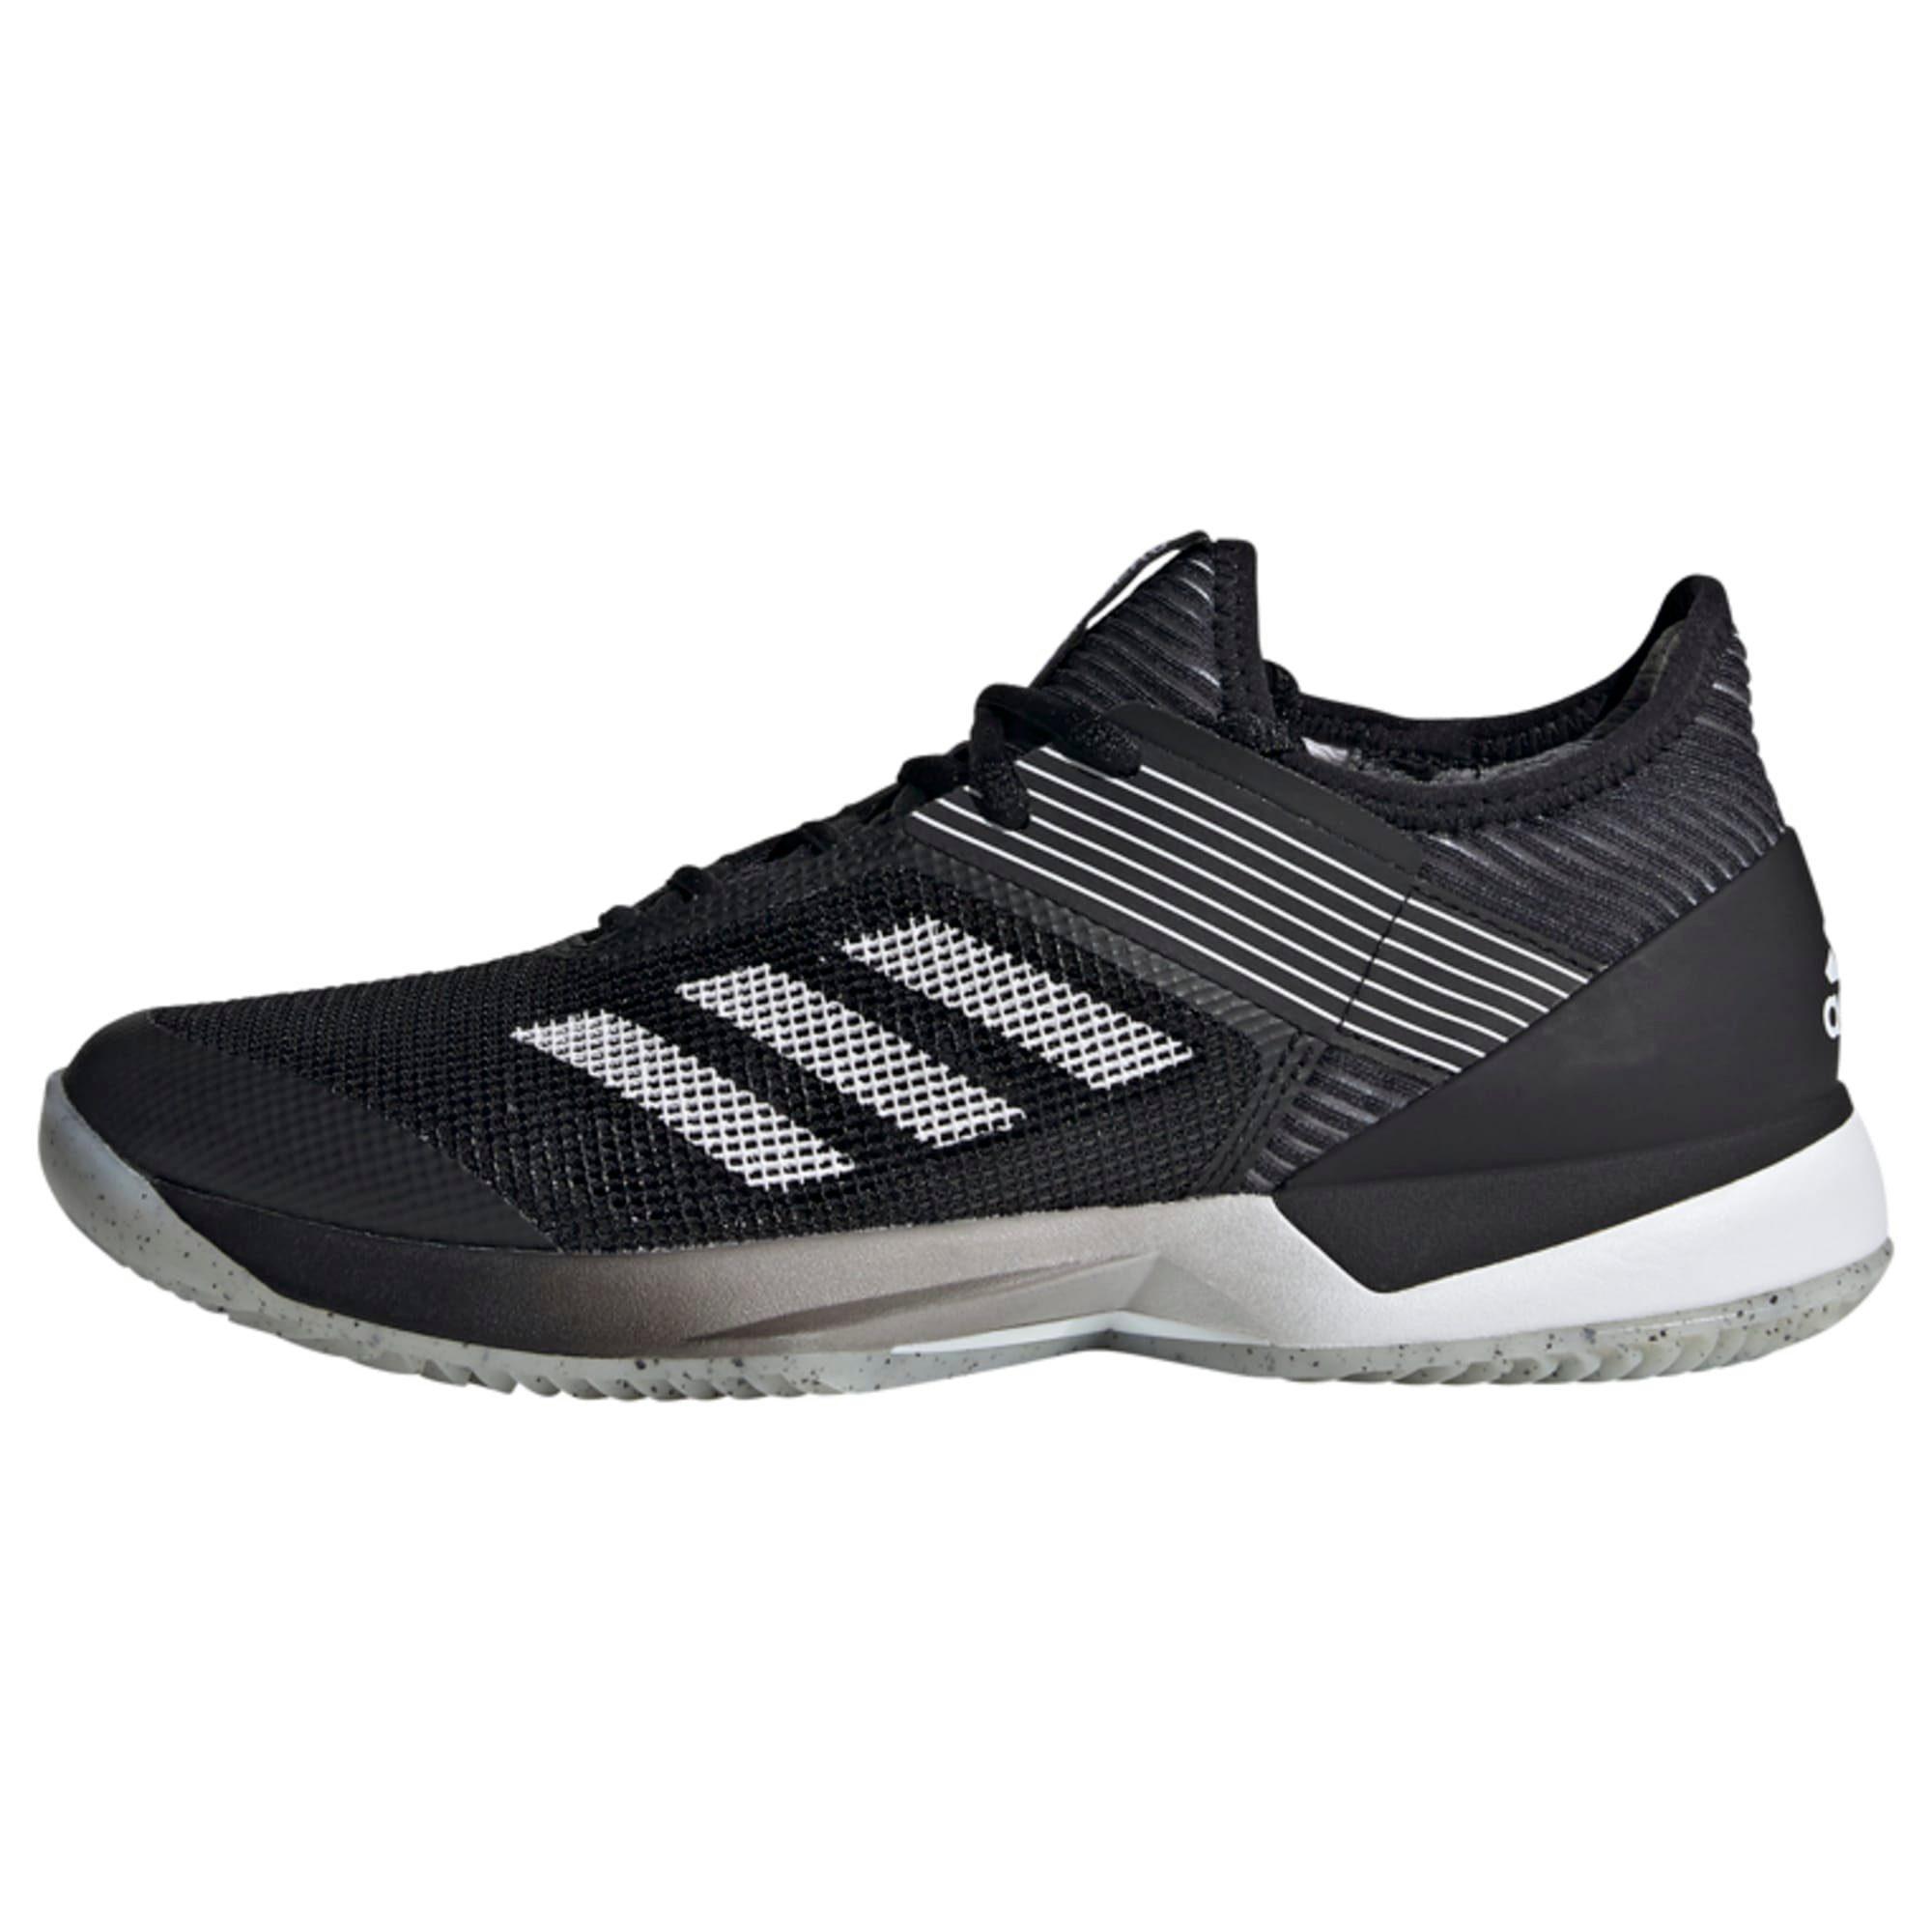 adidas Performance »Adizero Ubersonic 3.0 Clay Schuh« Laufschuh adizero online kaufen   OTTO